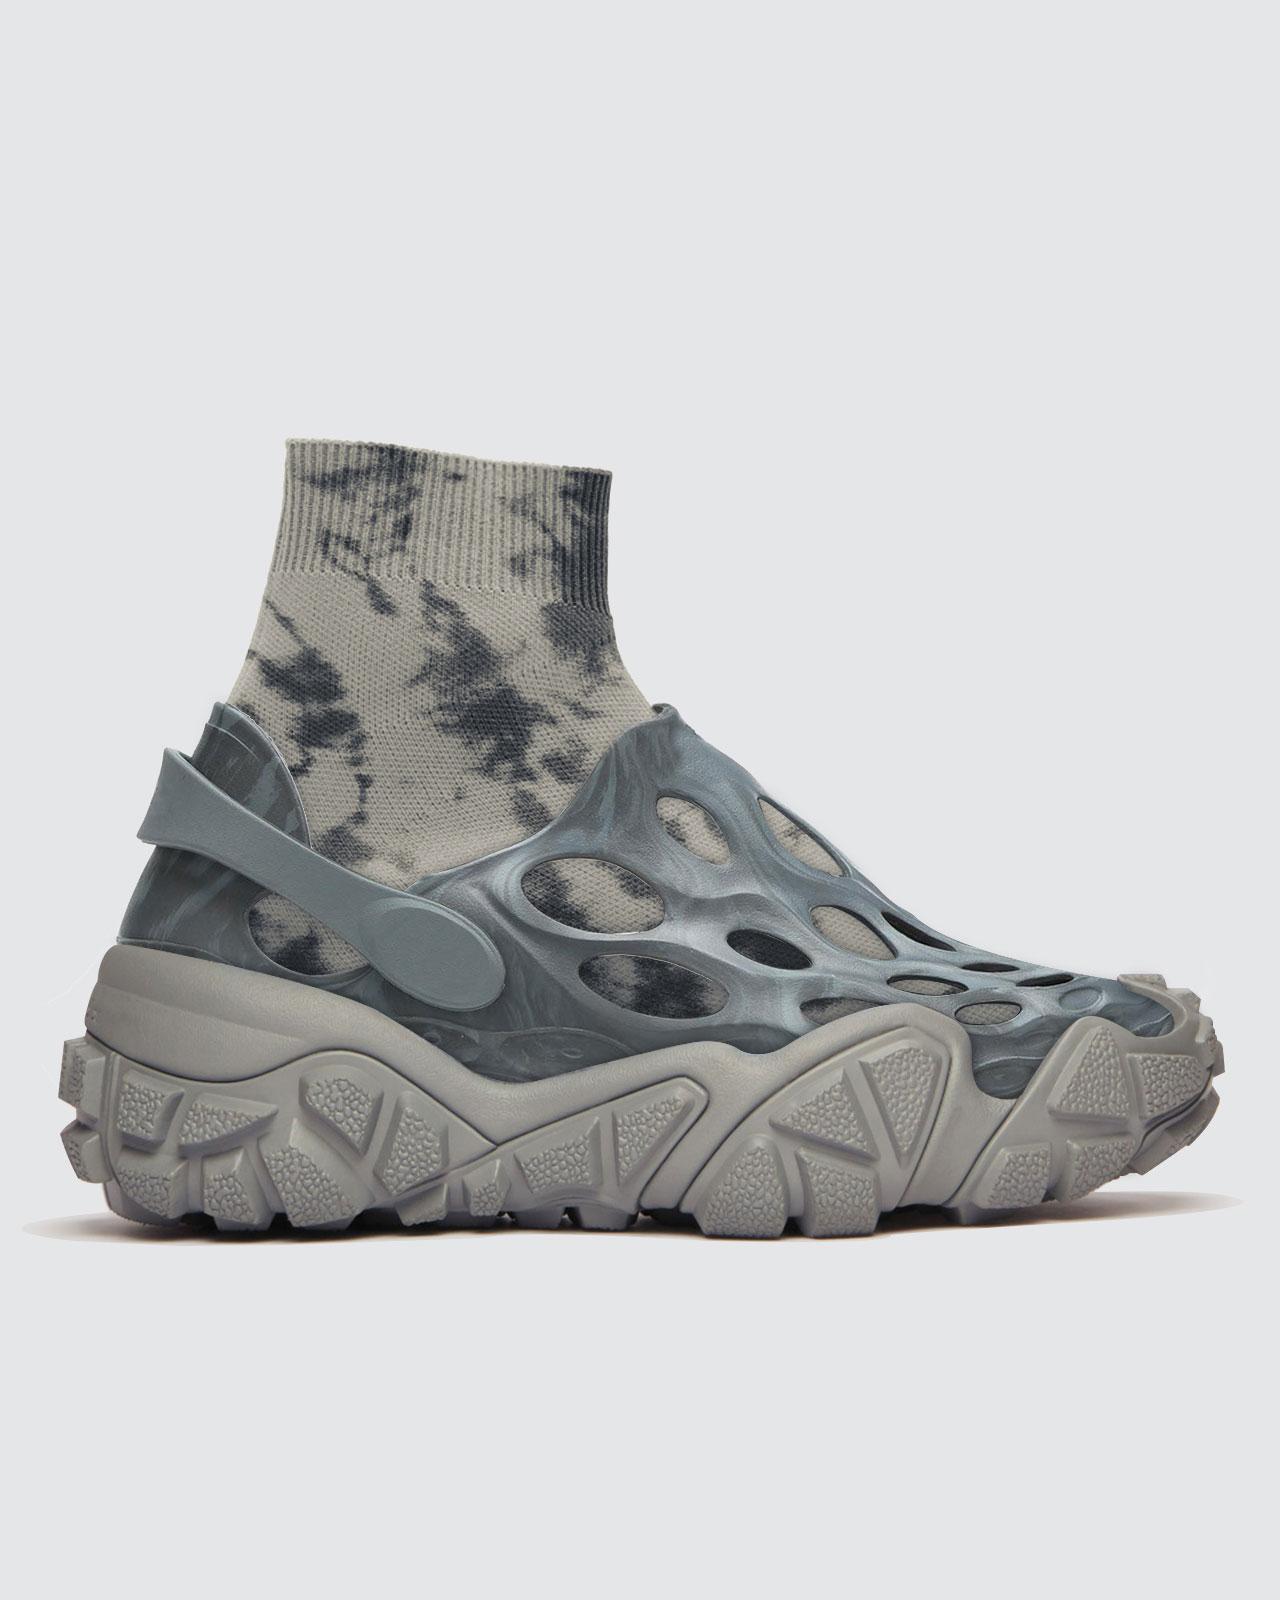 William Hildebrand - Footwear Concept   @wgh3